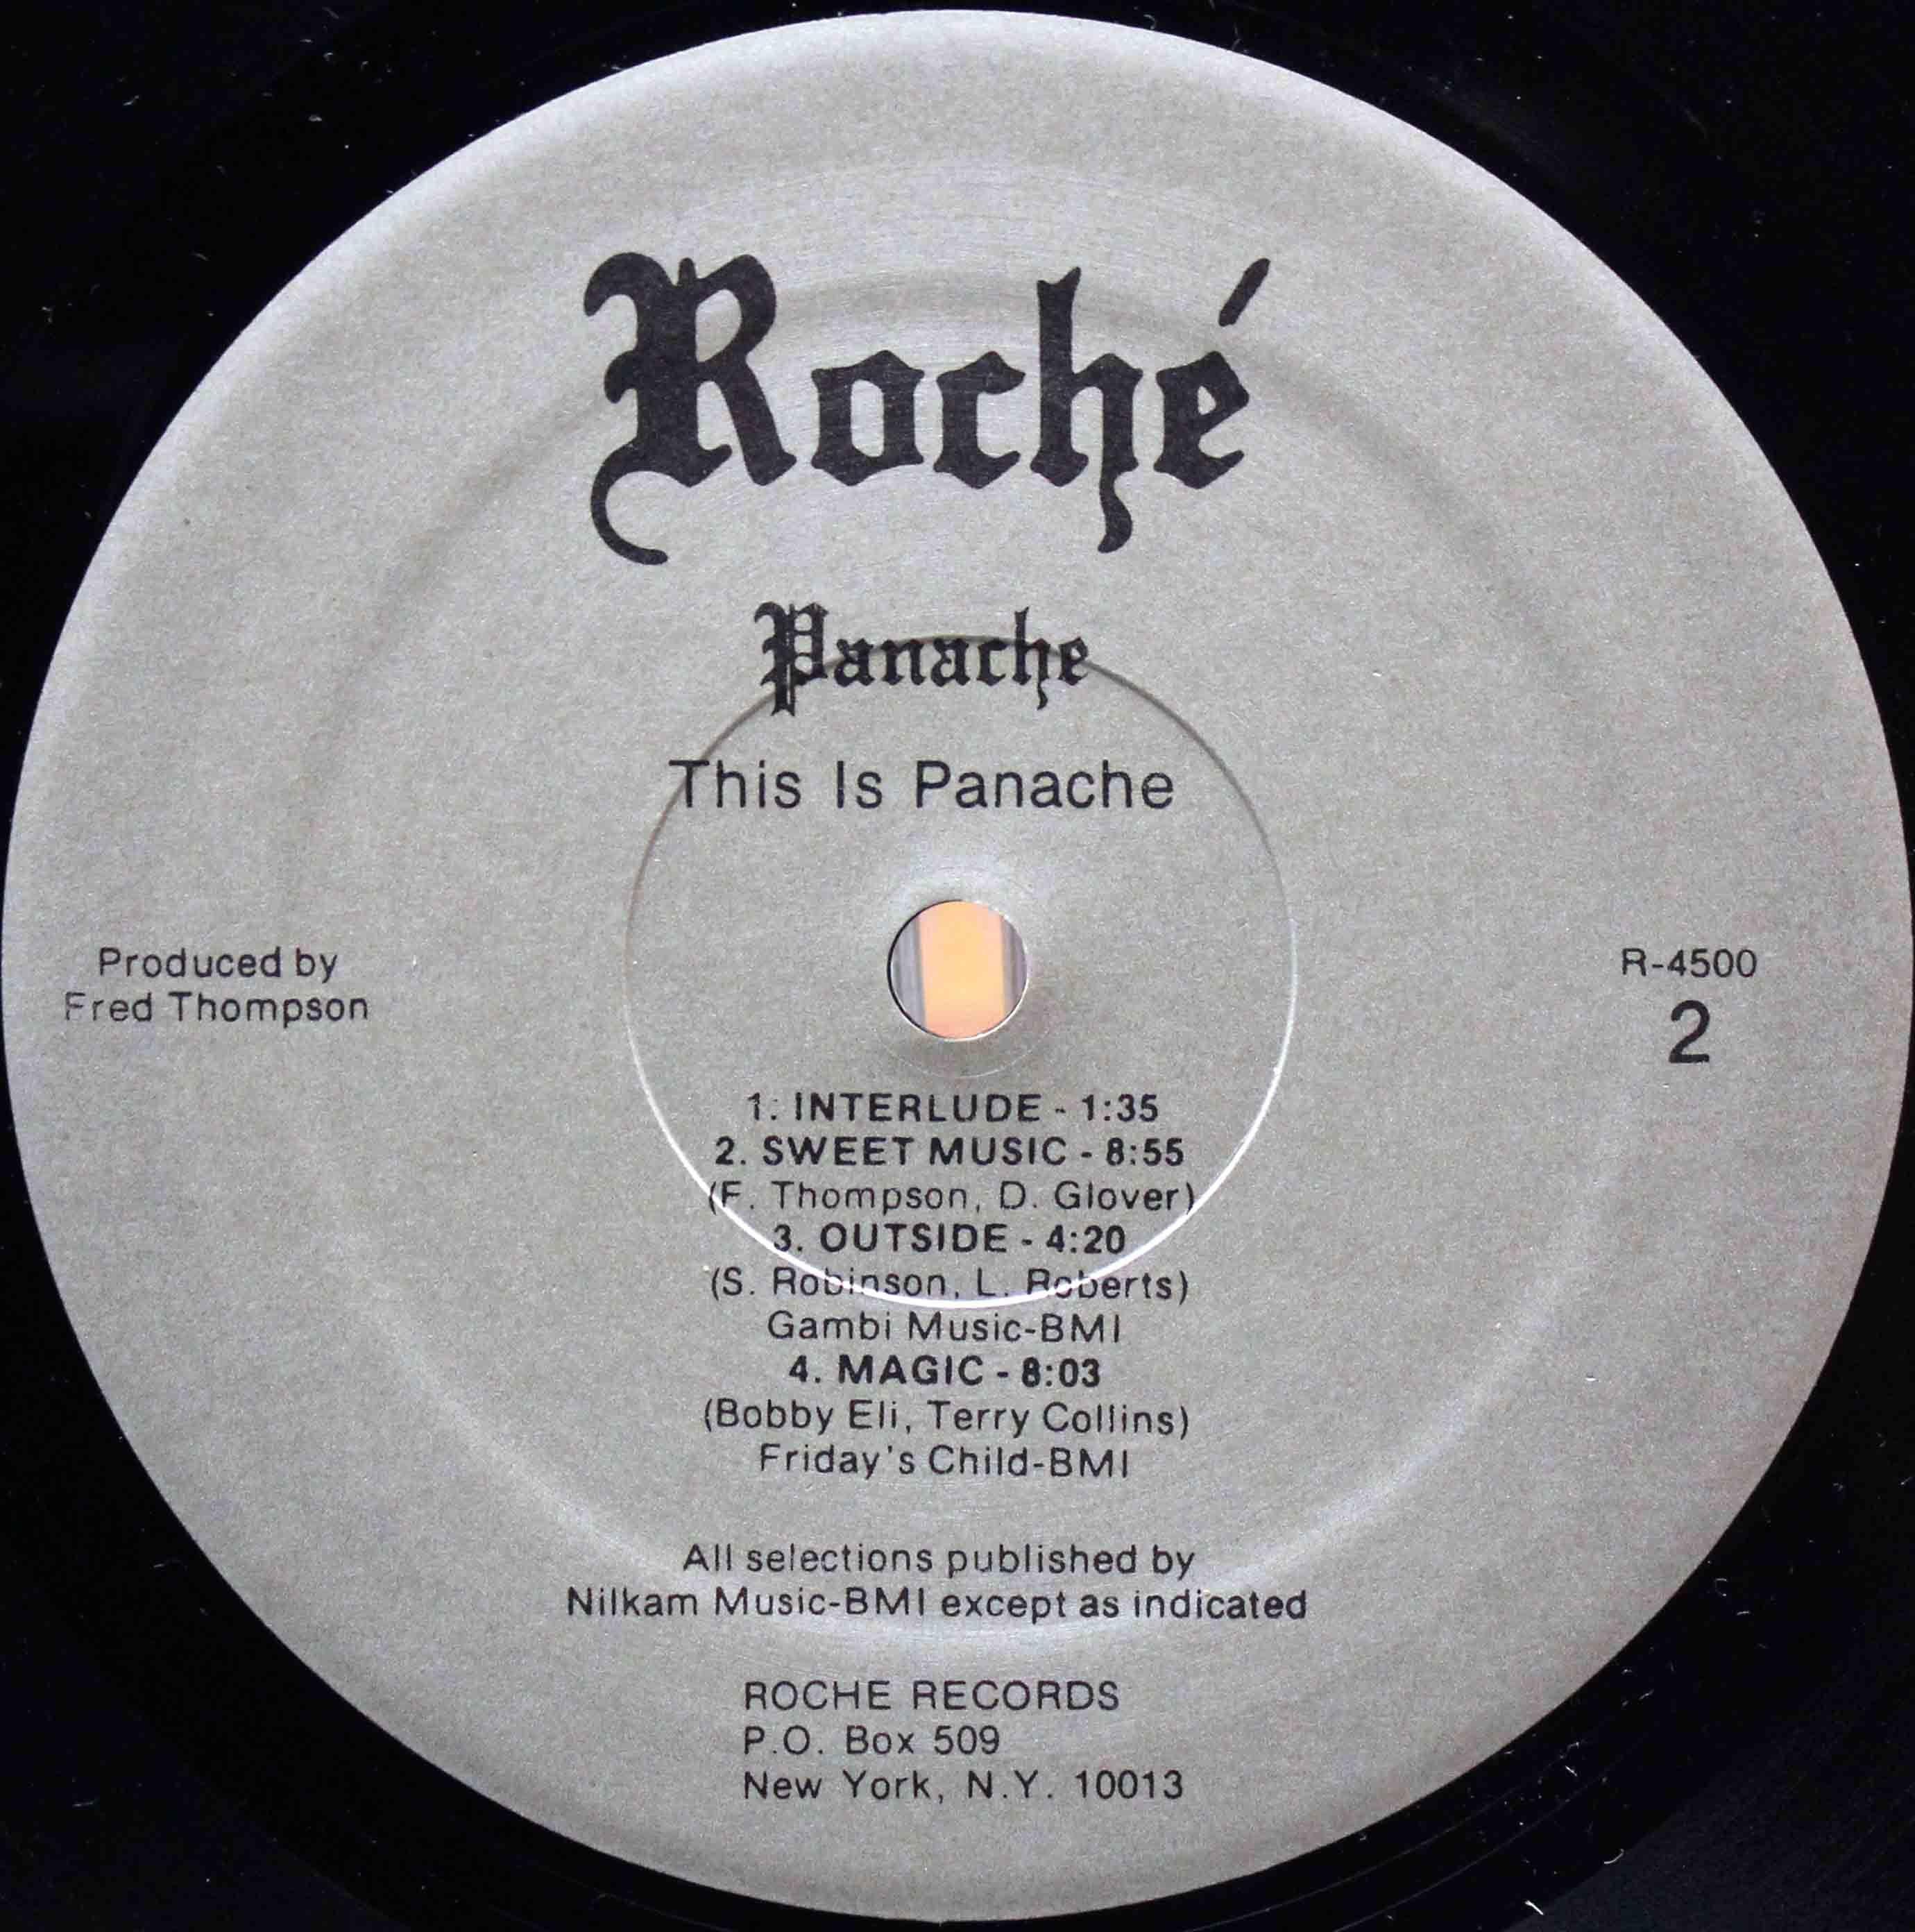 Panaché – This Is Panache 04